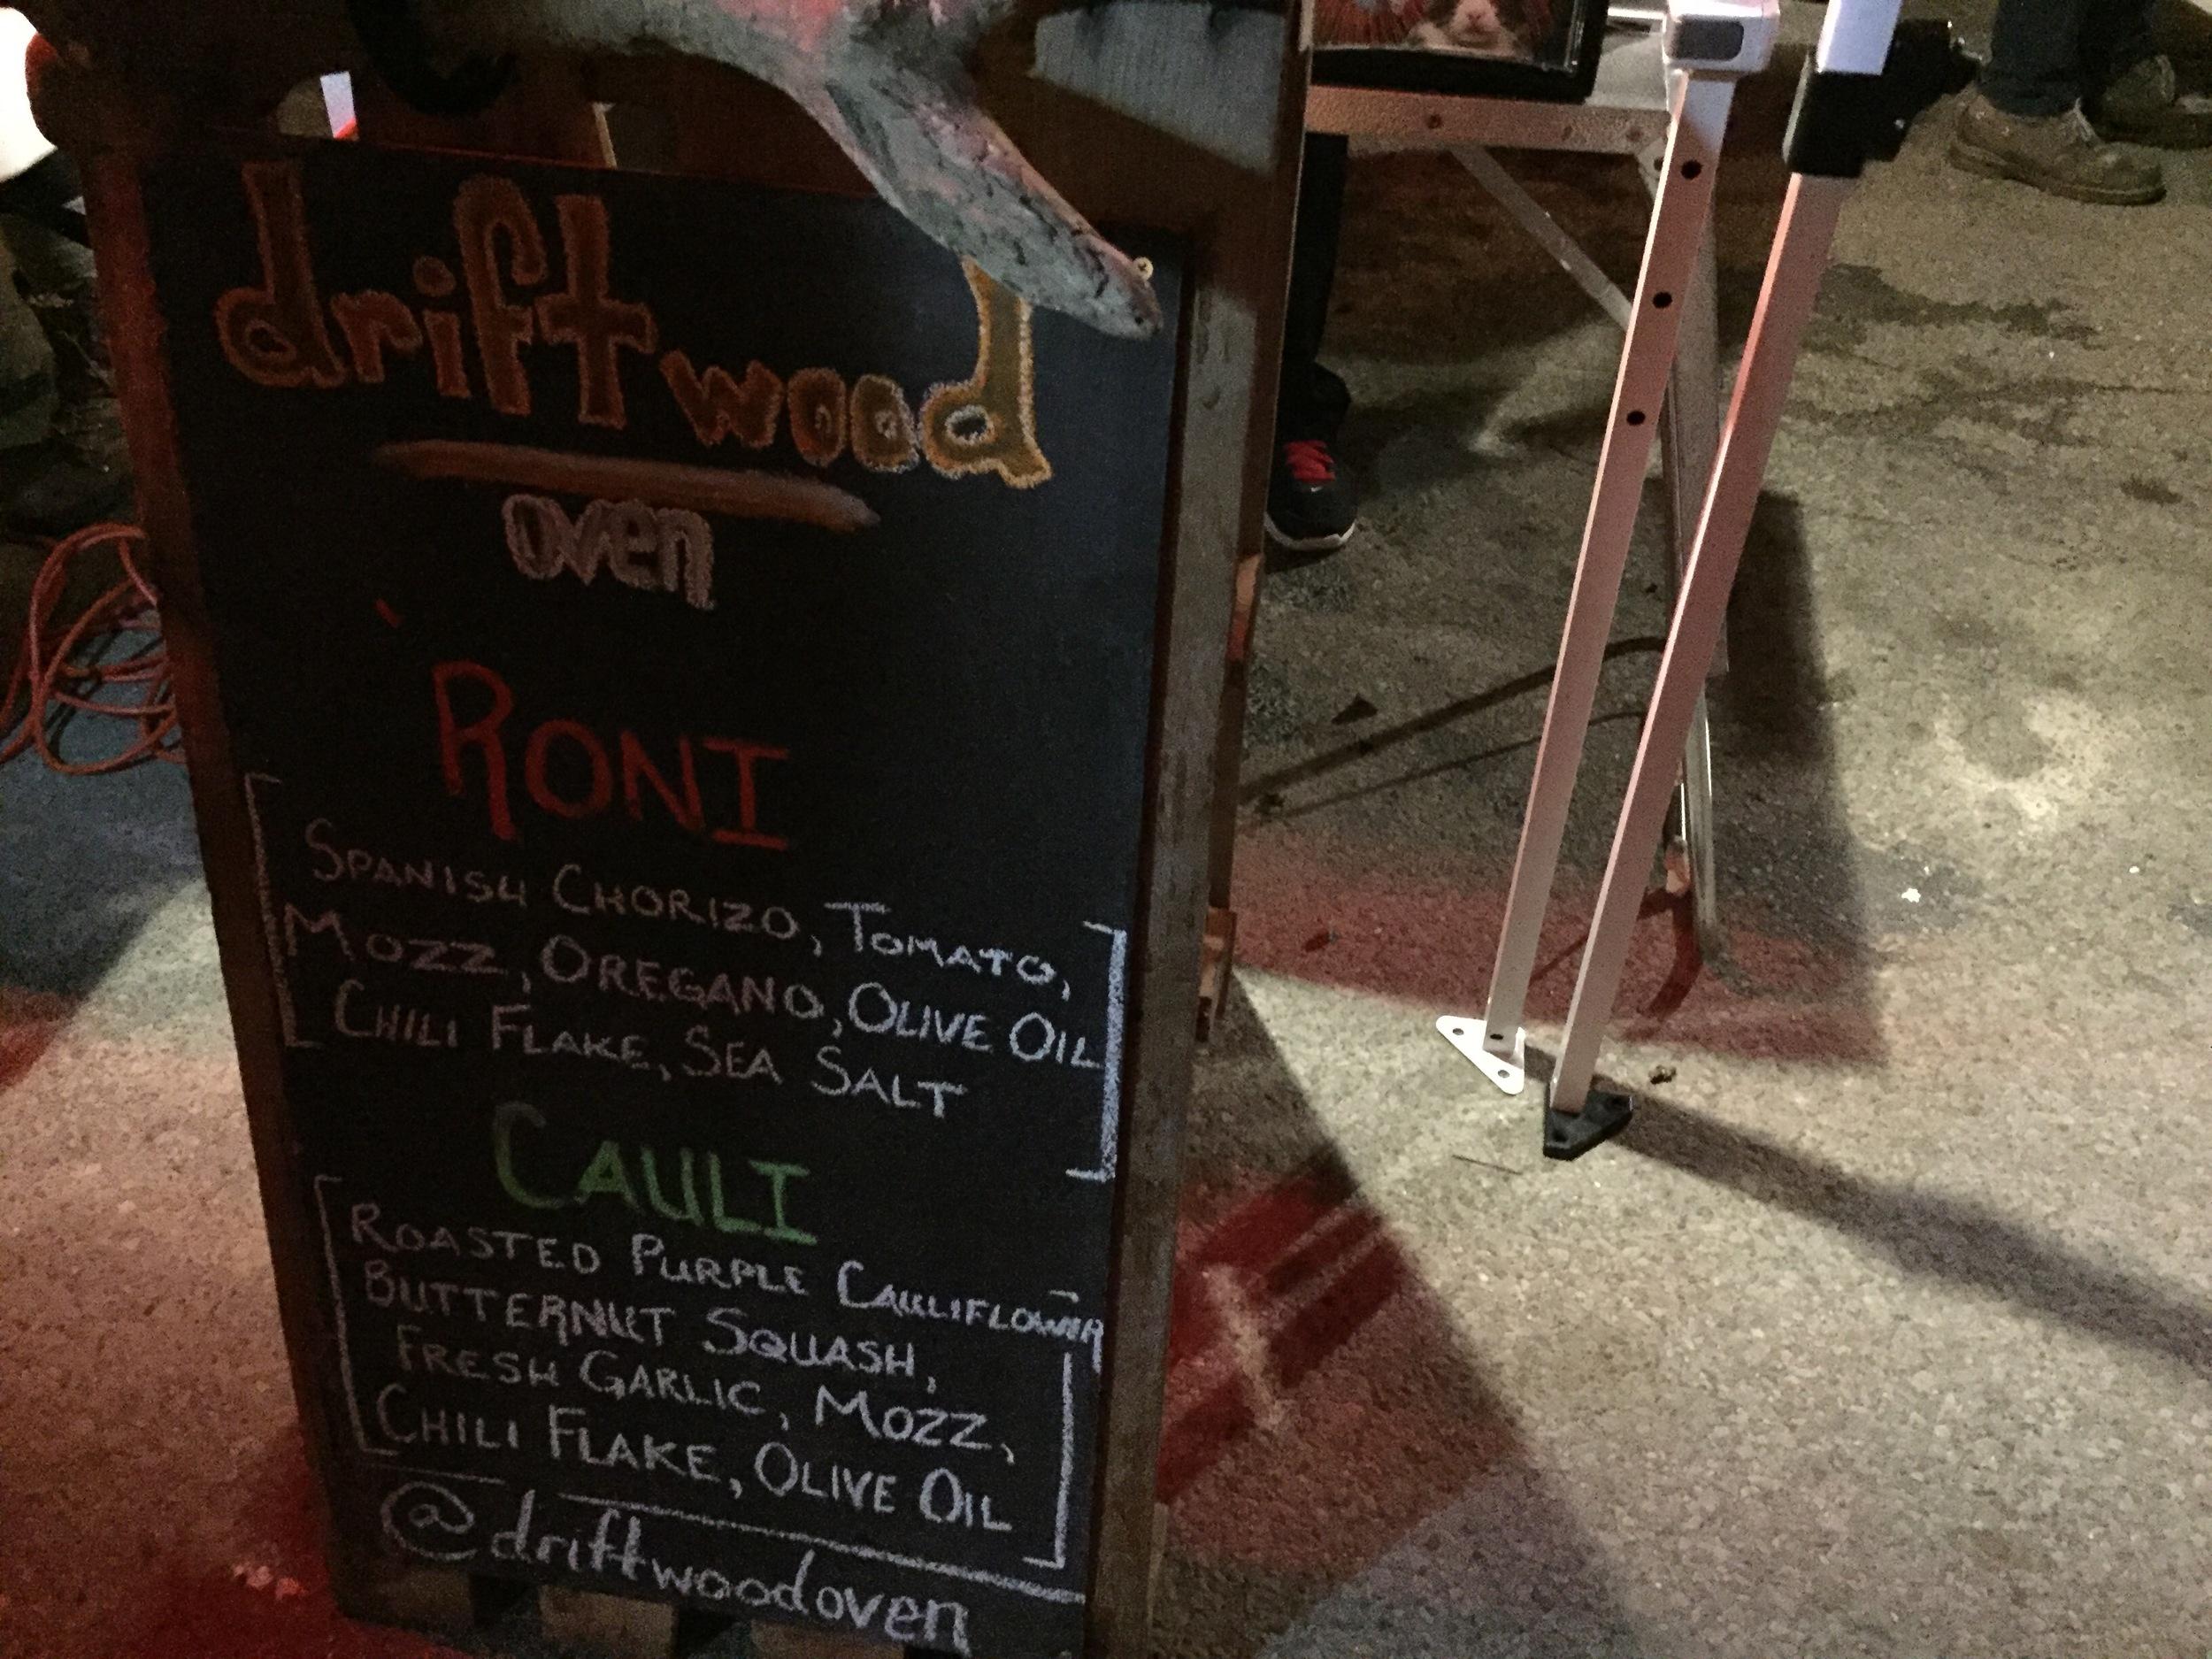 Driftwood Oven's Pizza Dojo lineup